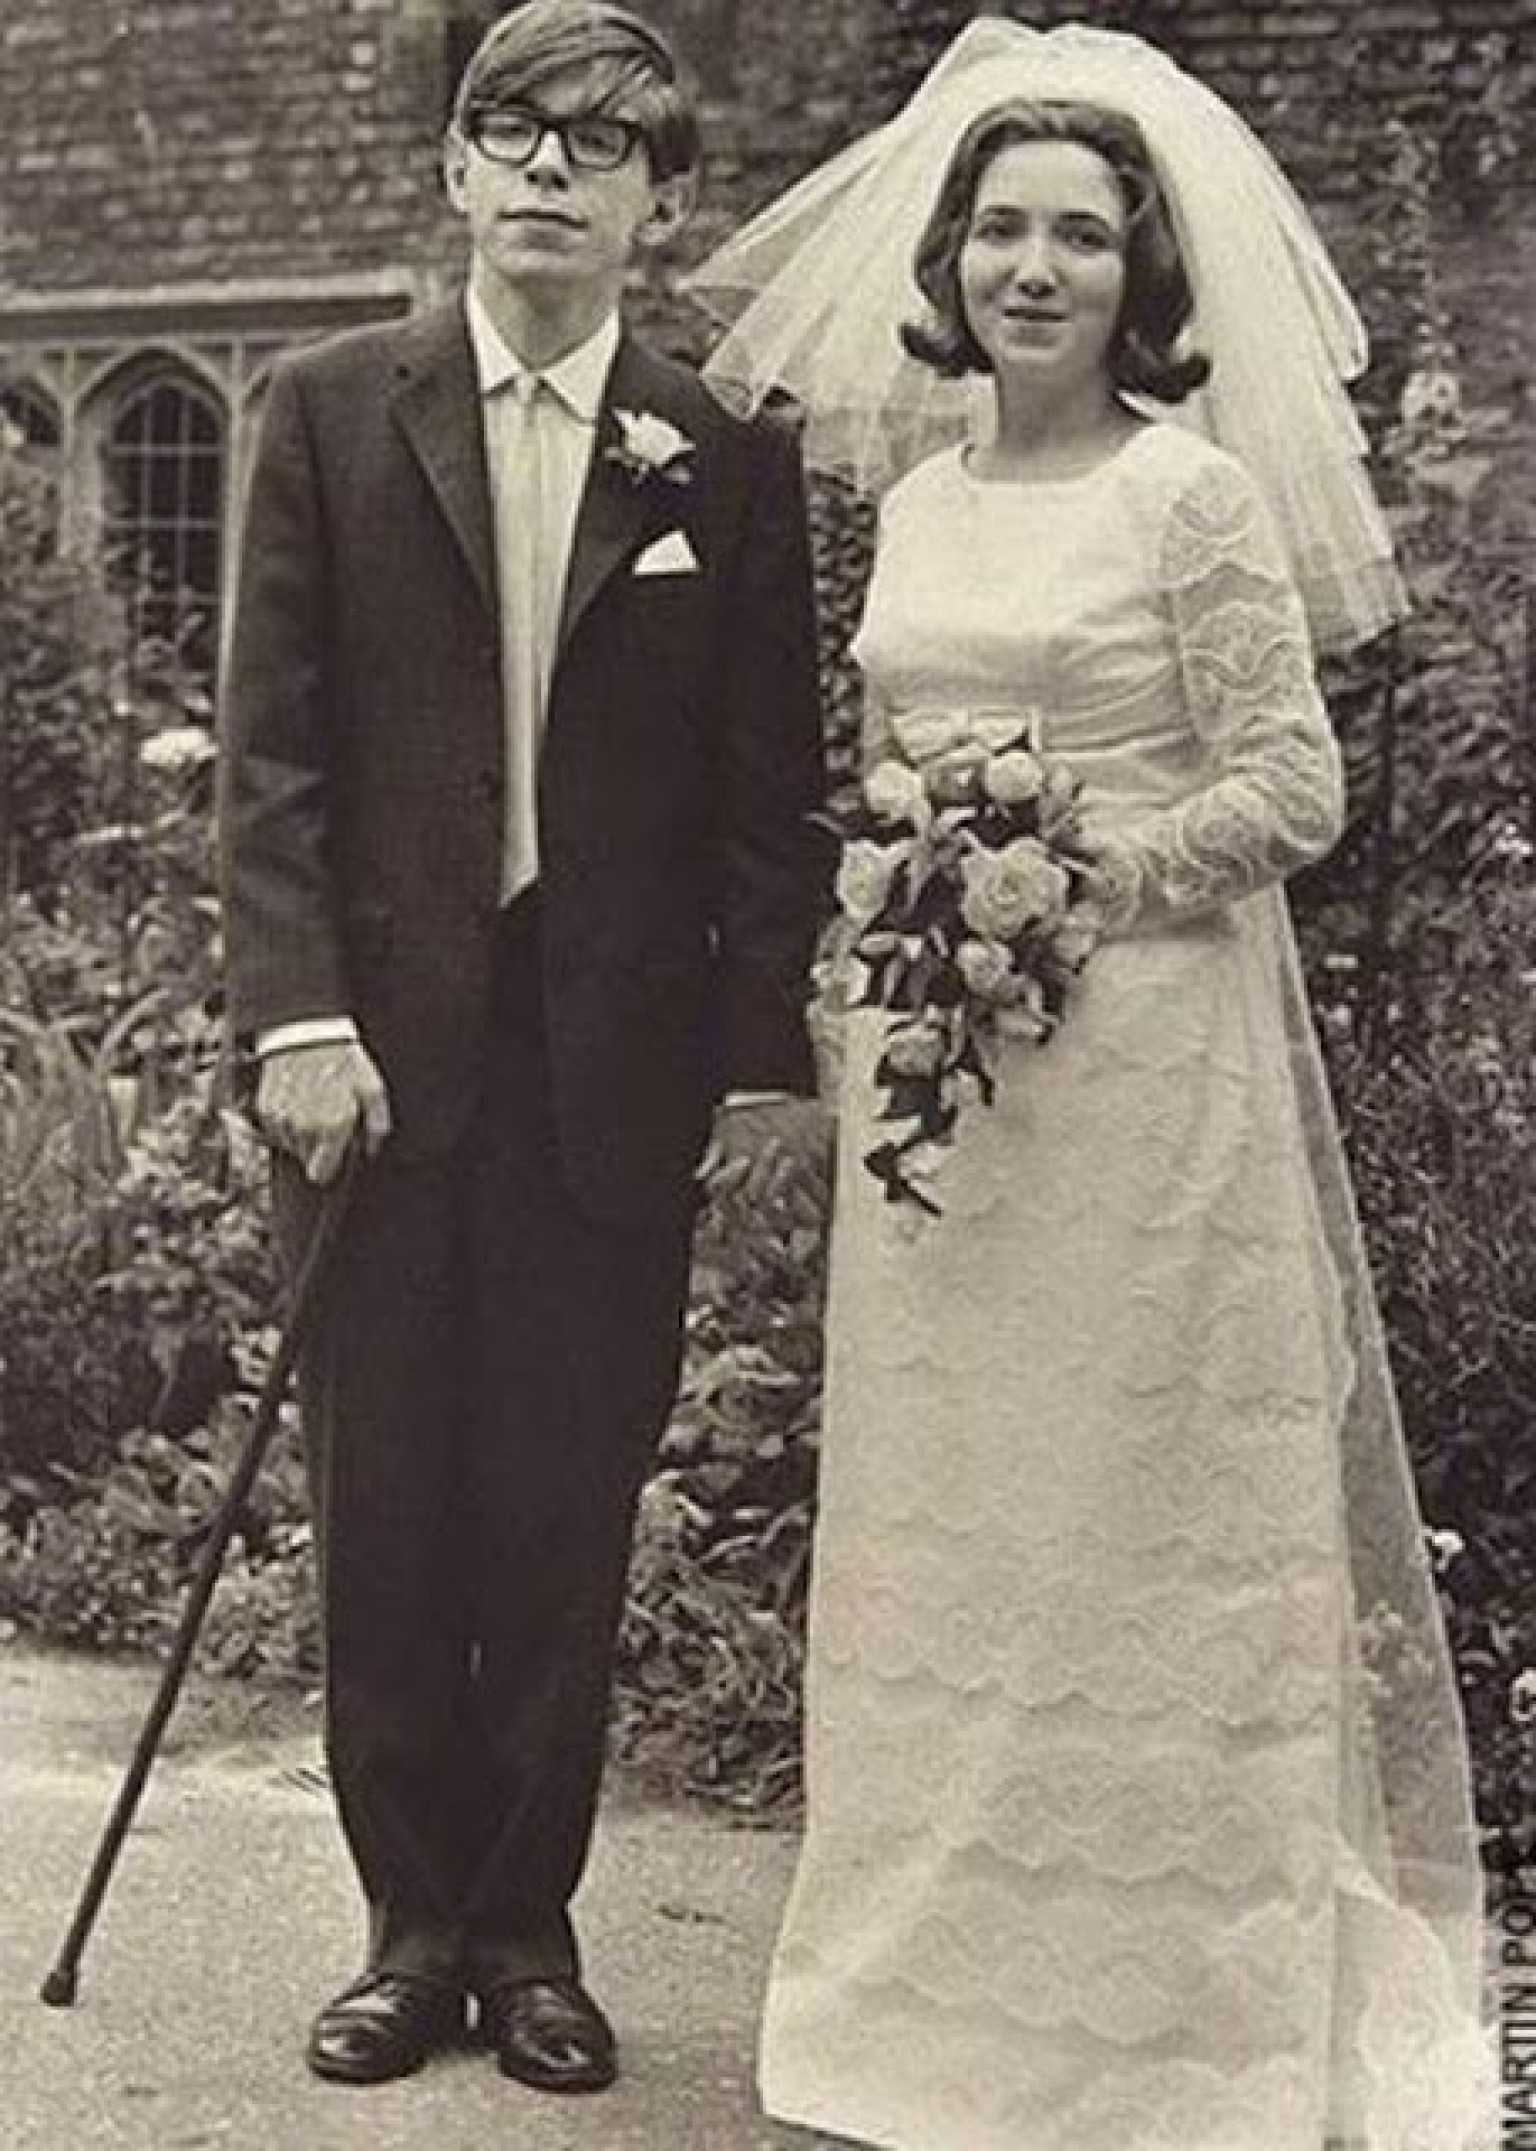 Stephen hawking wife jane wilde look lovely on their wedding day in